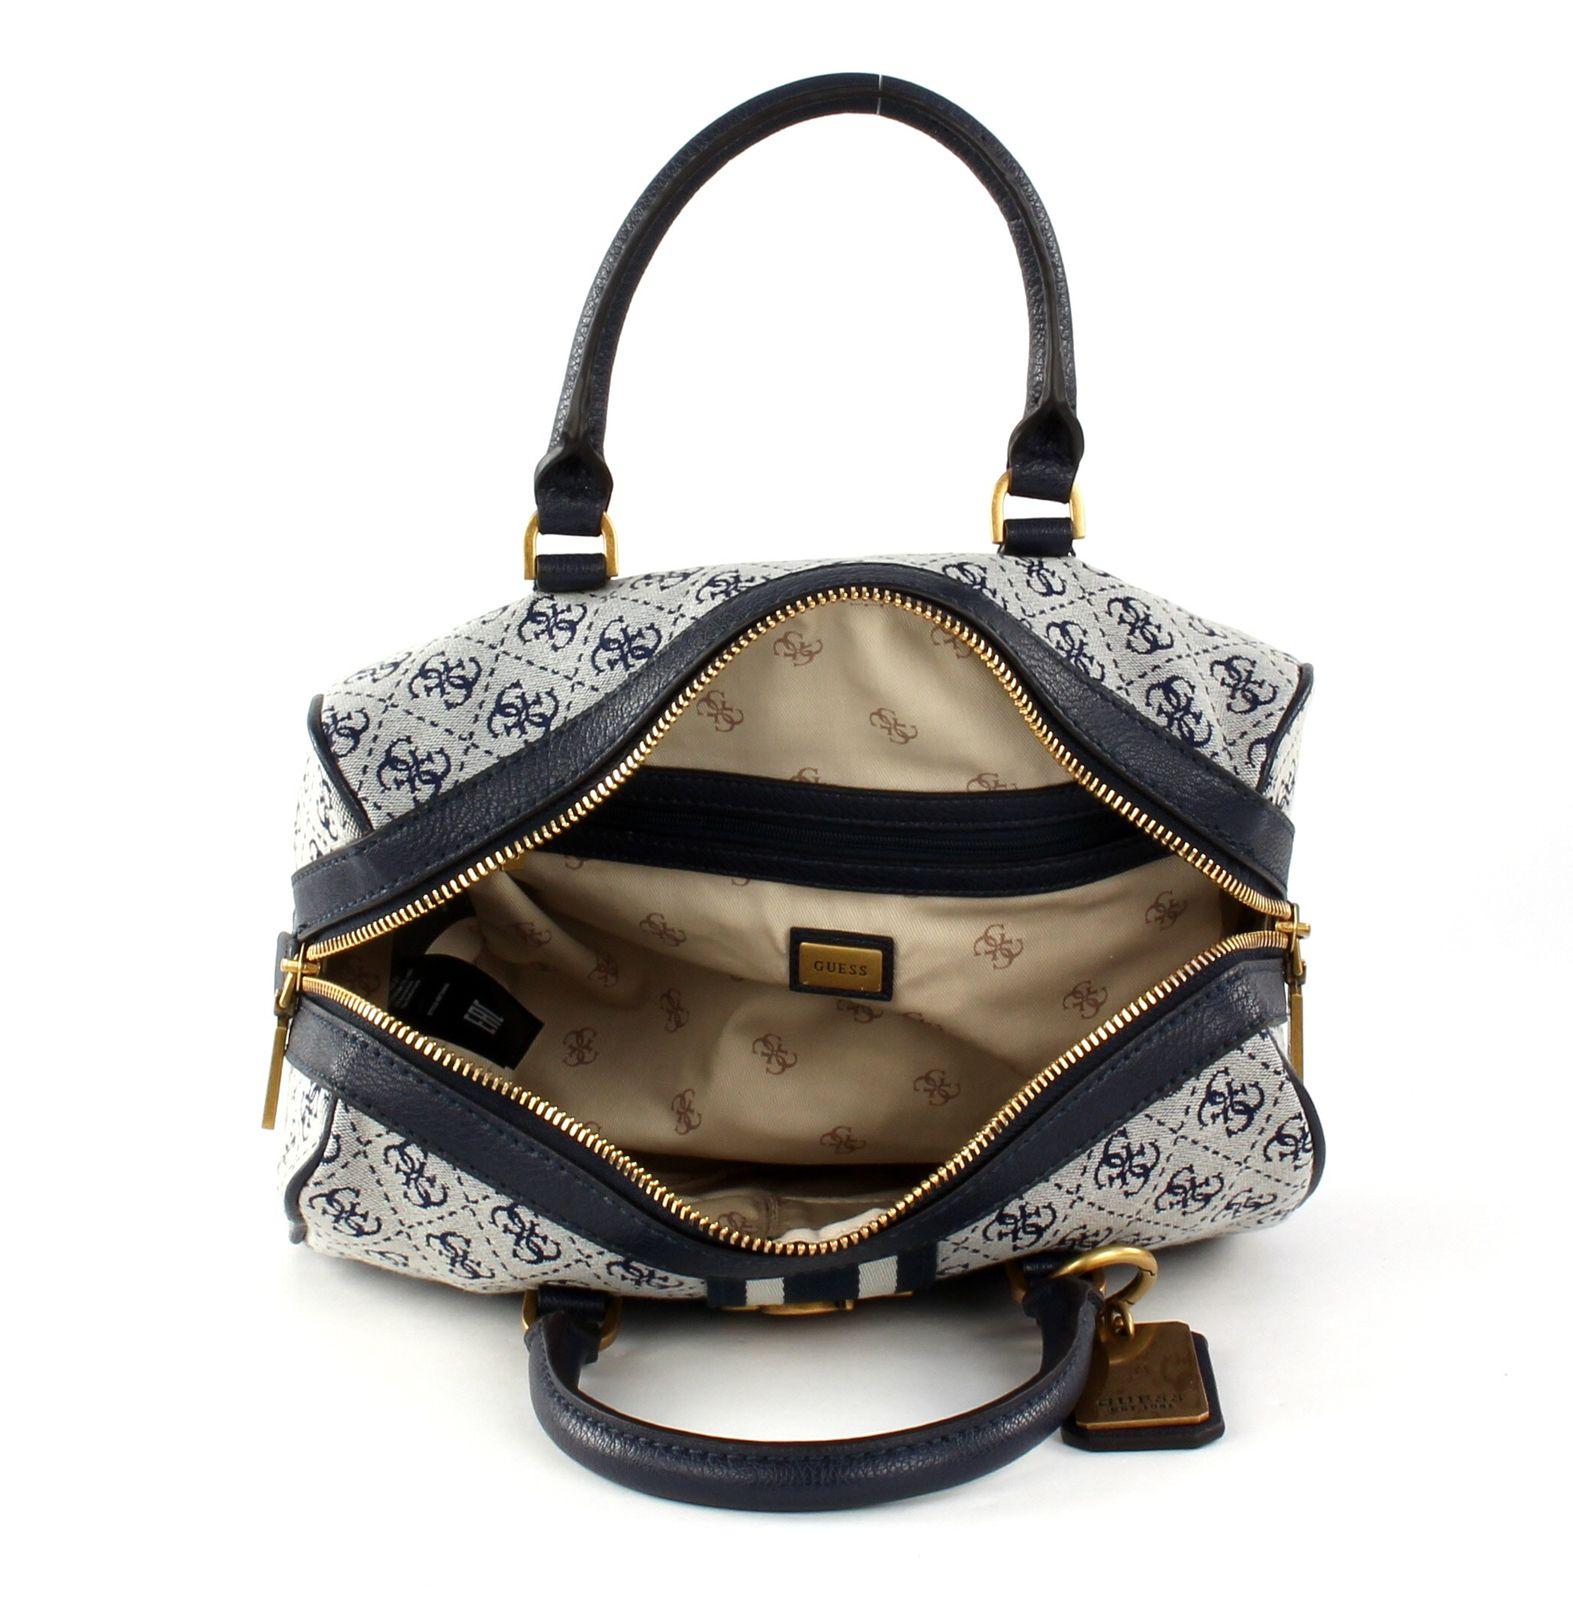 Guess Vintage Damen Handtasche Braun: : Koffer